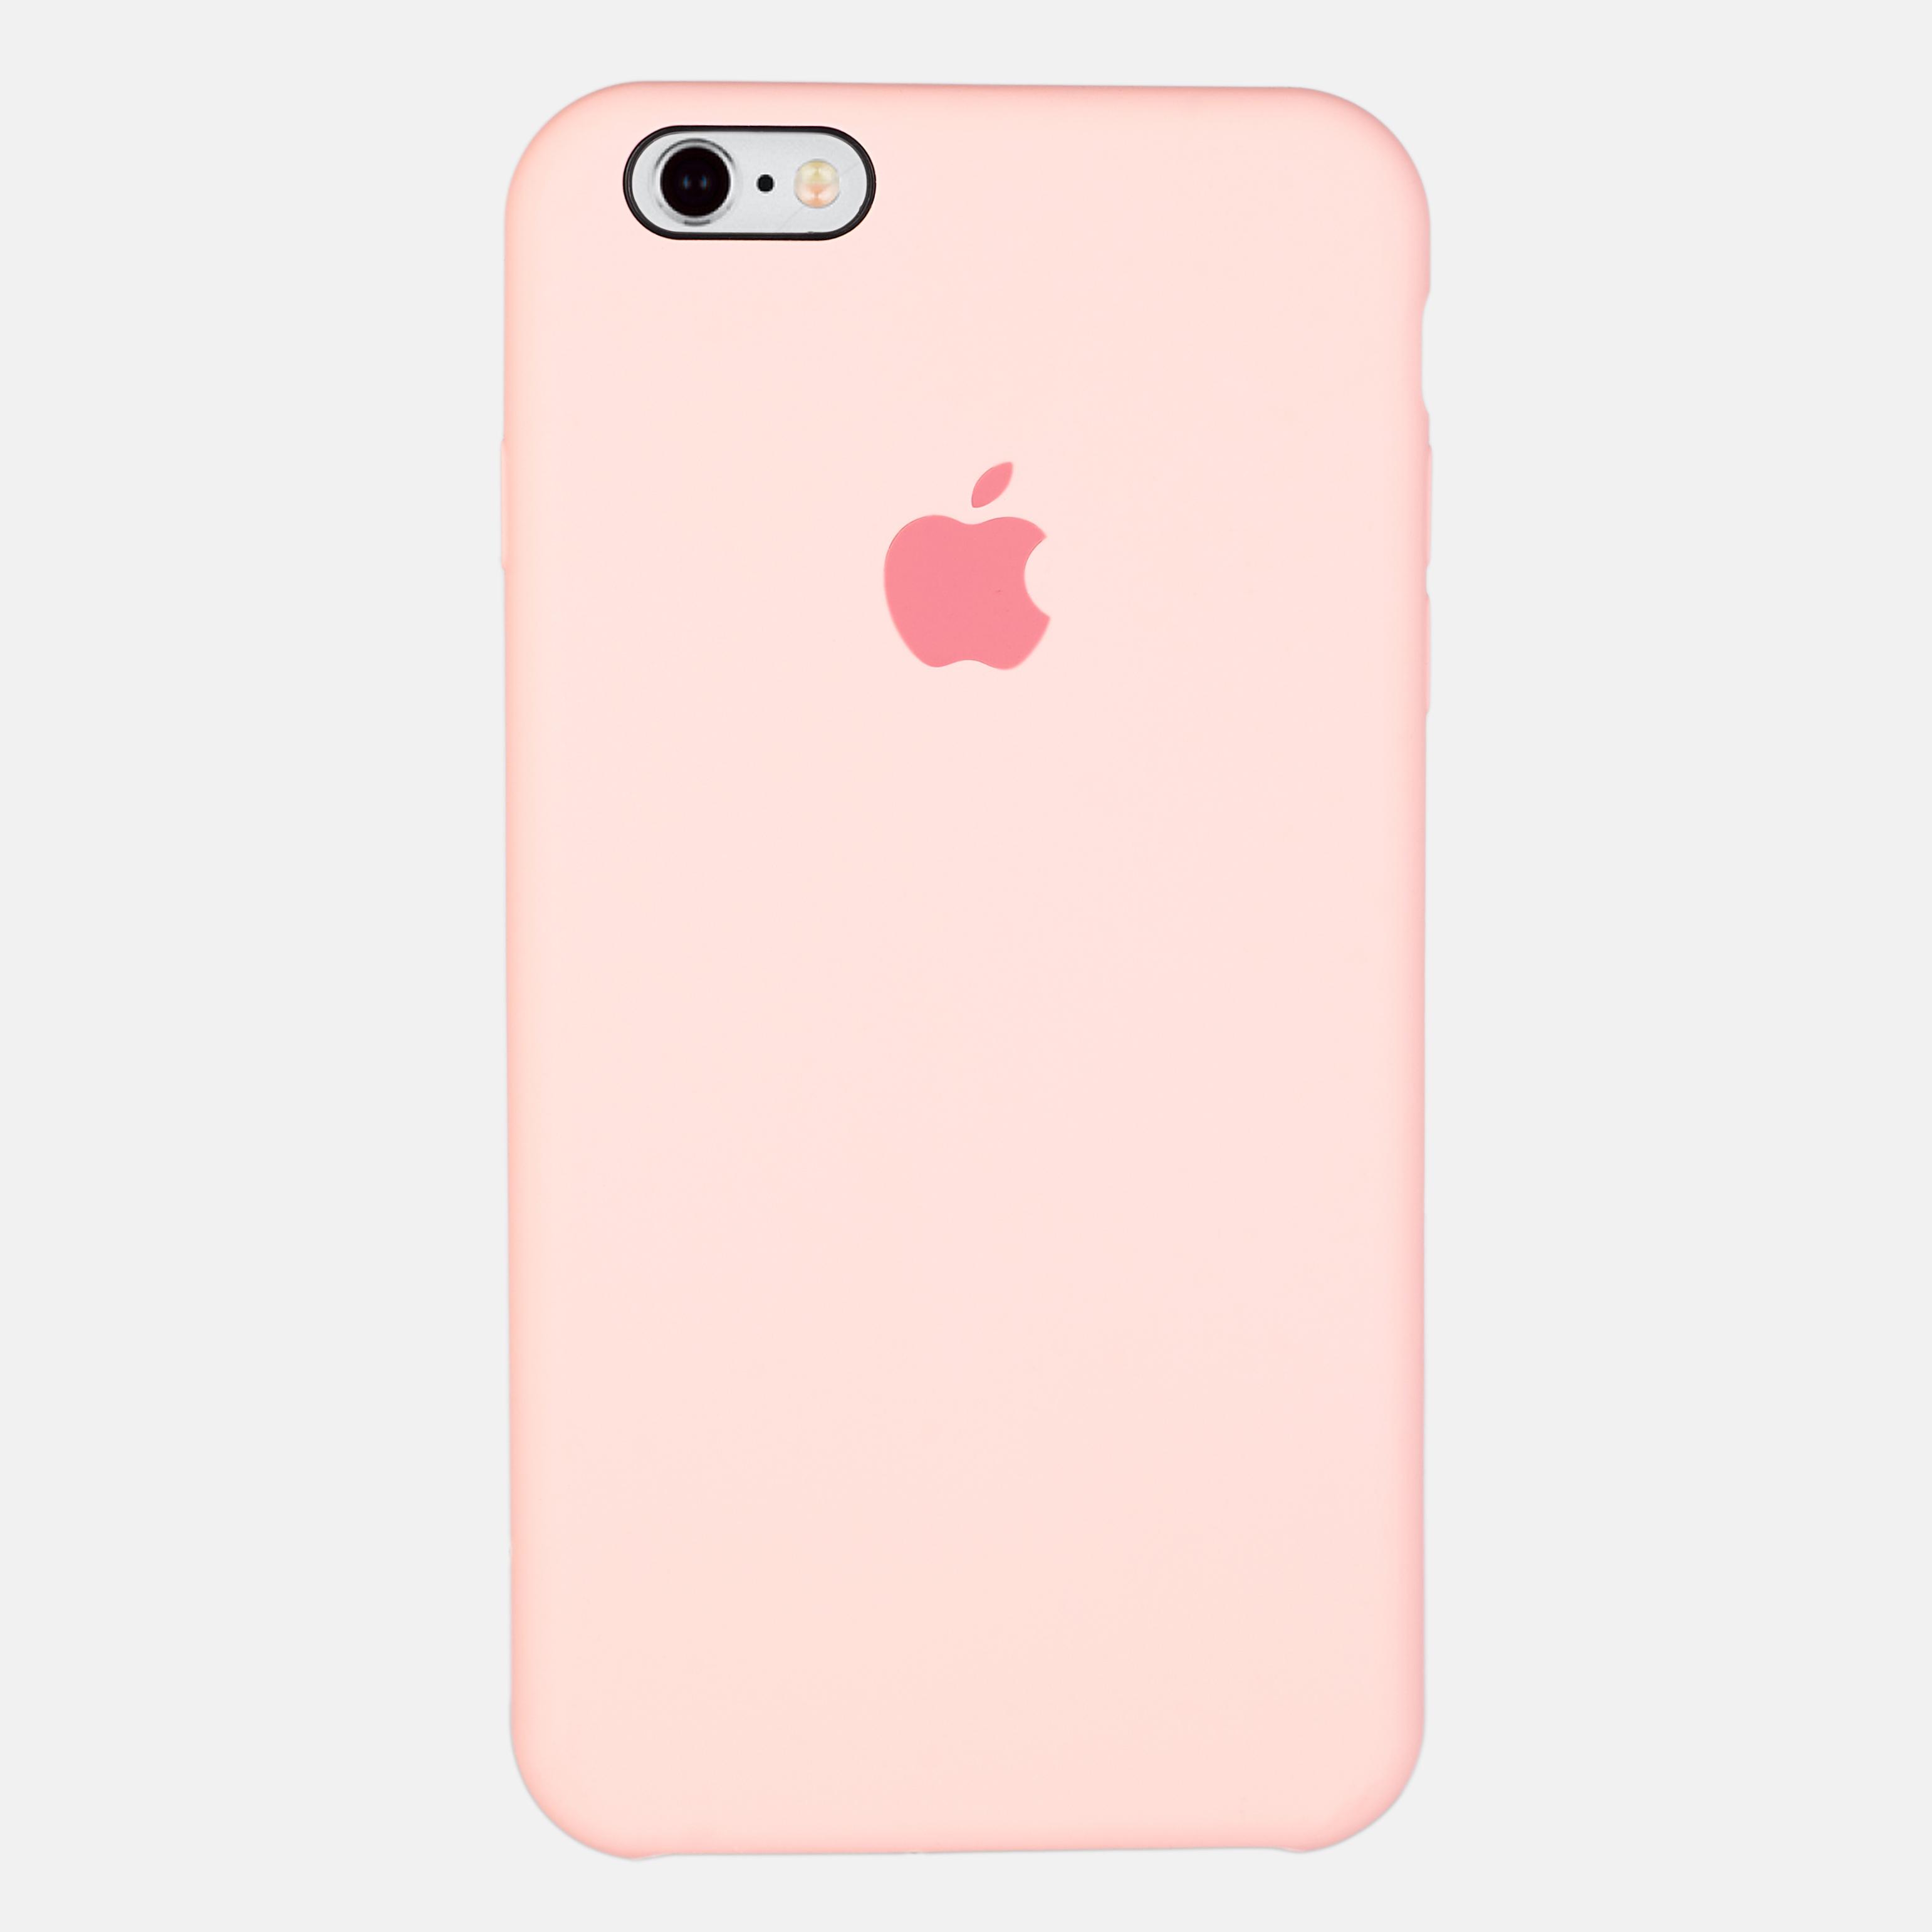 Розовый чехол Silicone Case для iPhone 6/6S